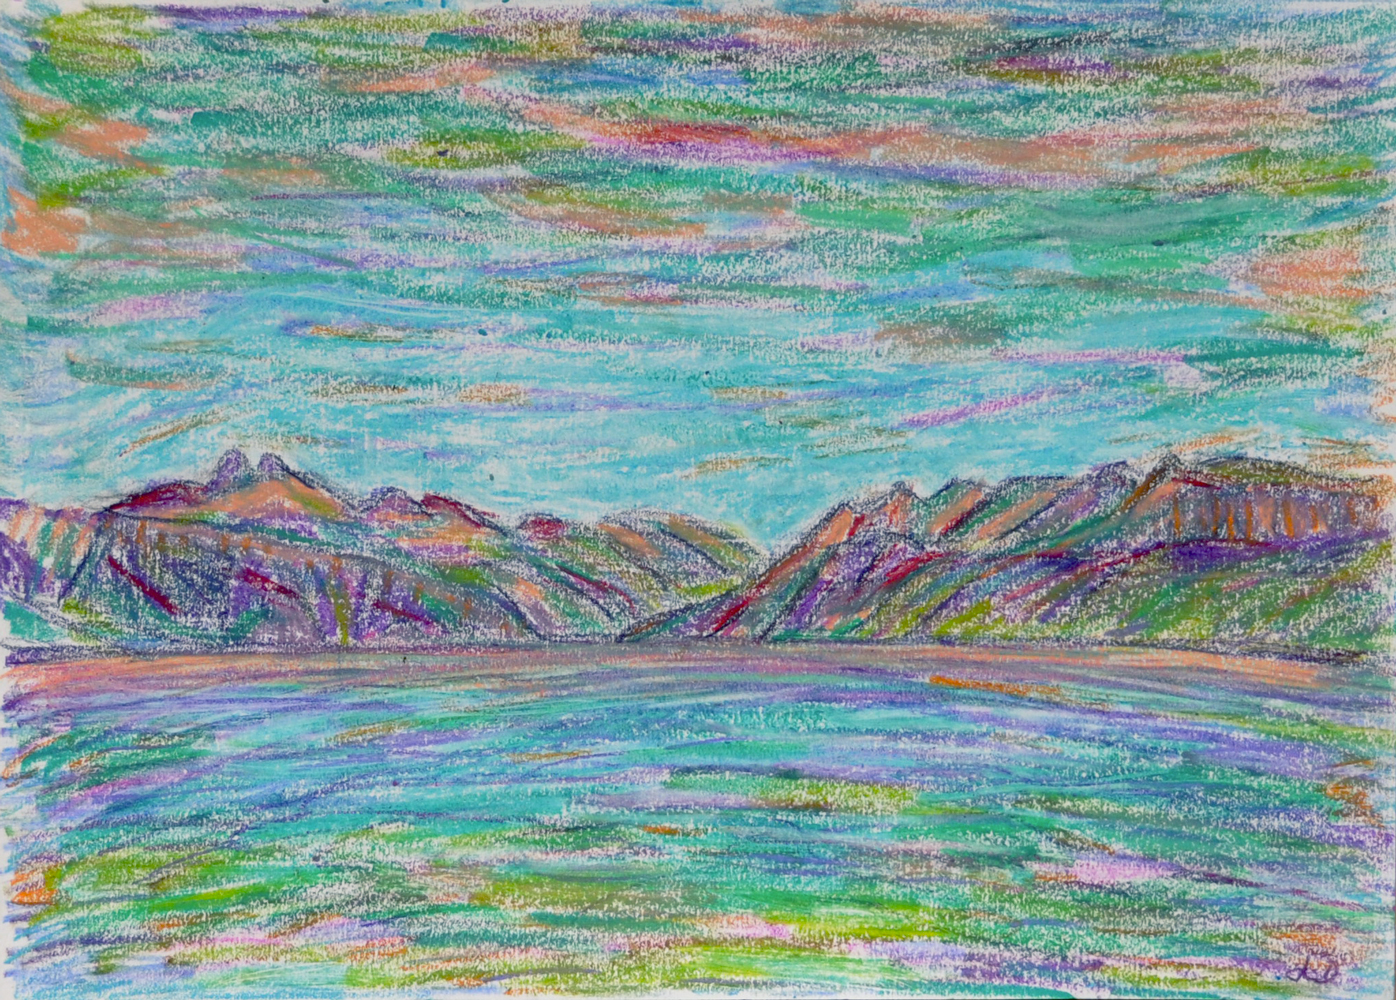 Lake Geneva, St Prex no. 7. Mixed media on paper, 21x30, 2018